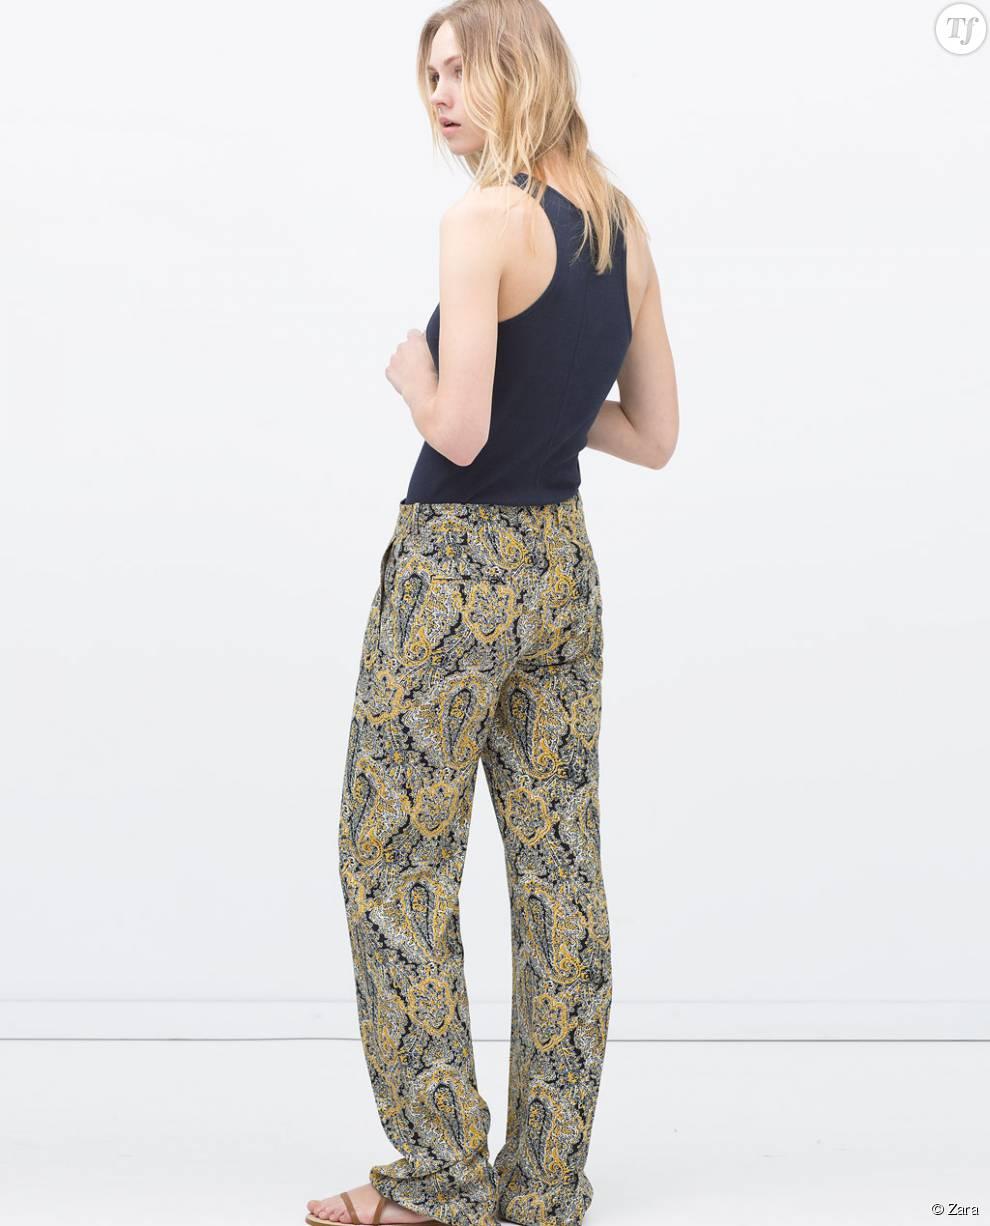 pantalon carotte femme zara pantalon patte dulphant beige femme zara taille m with pantalon. Black Bedroom Furniture Sets. Home Design Ideas